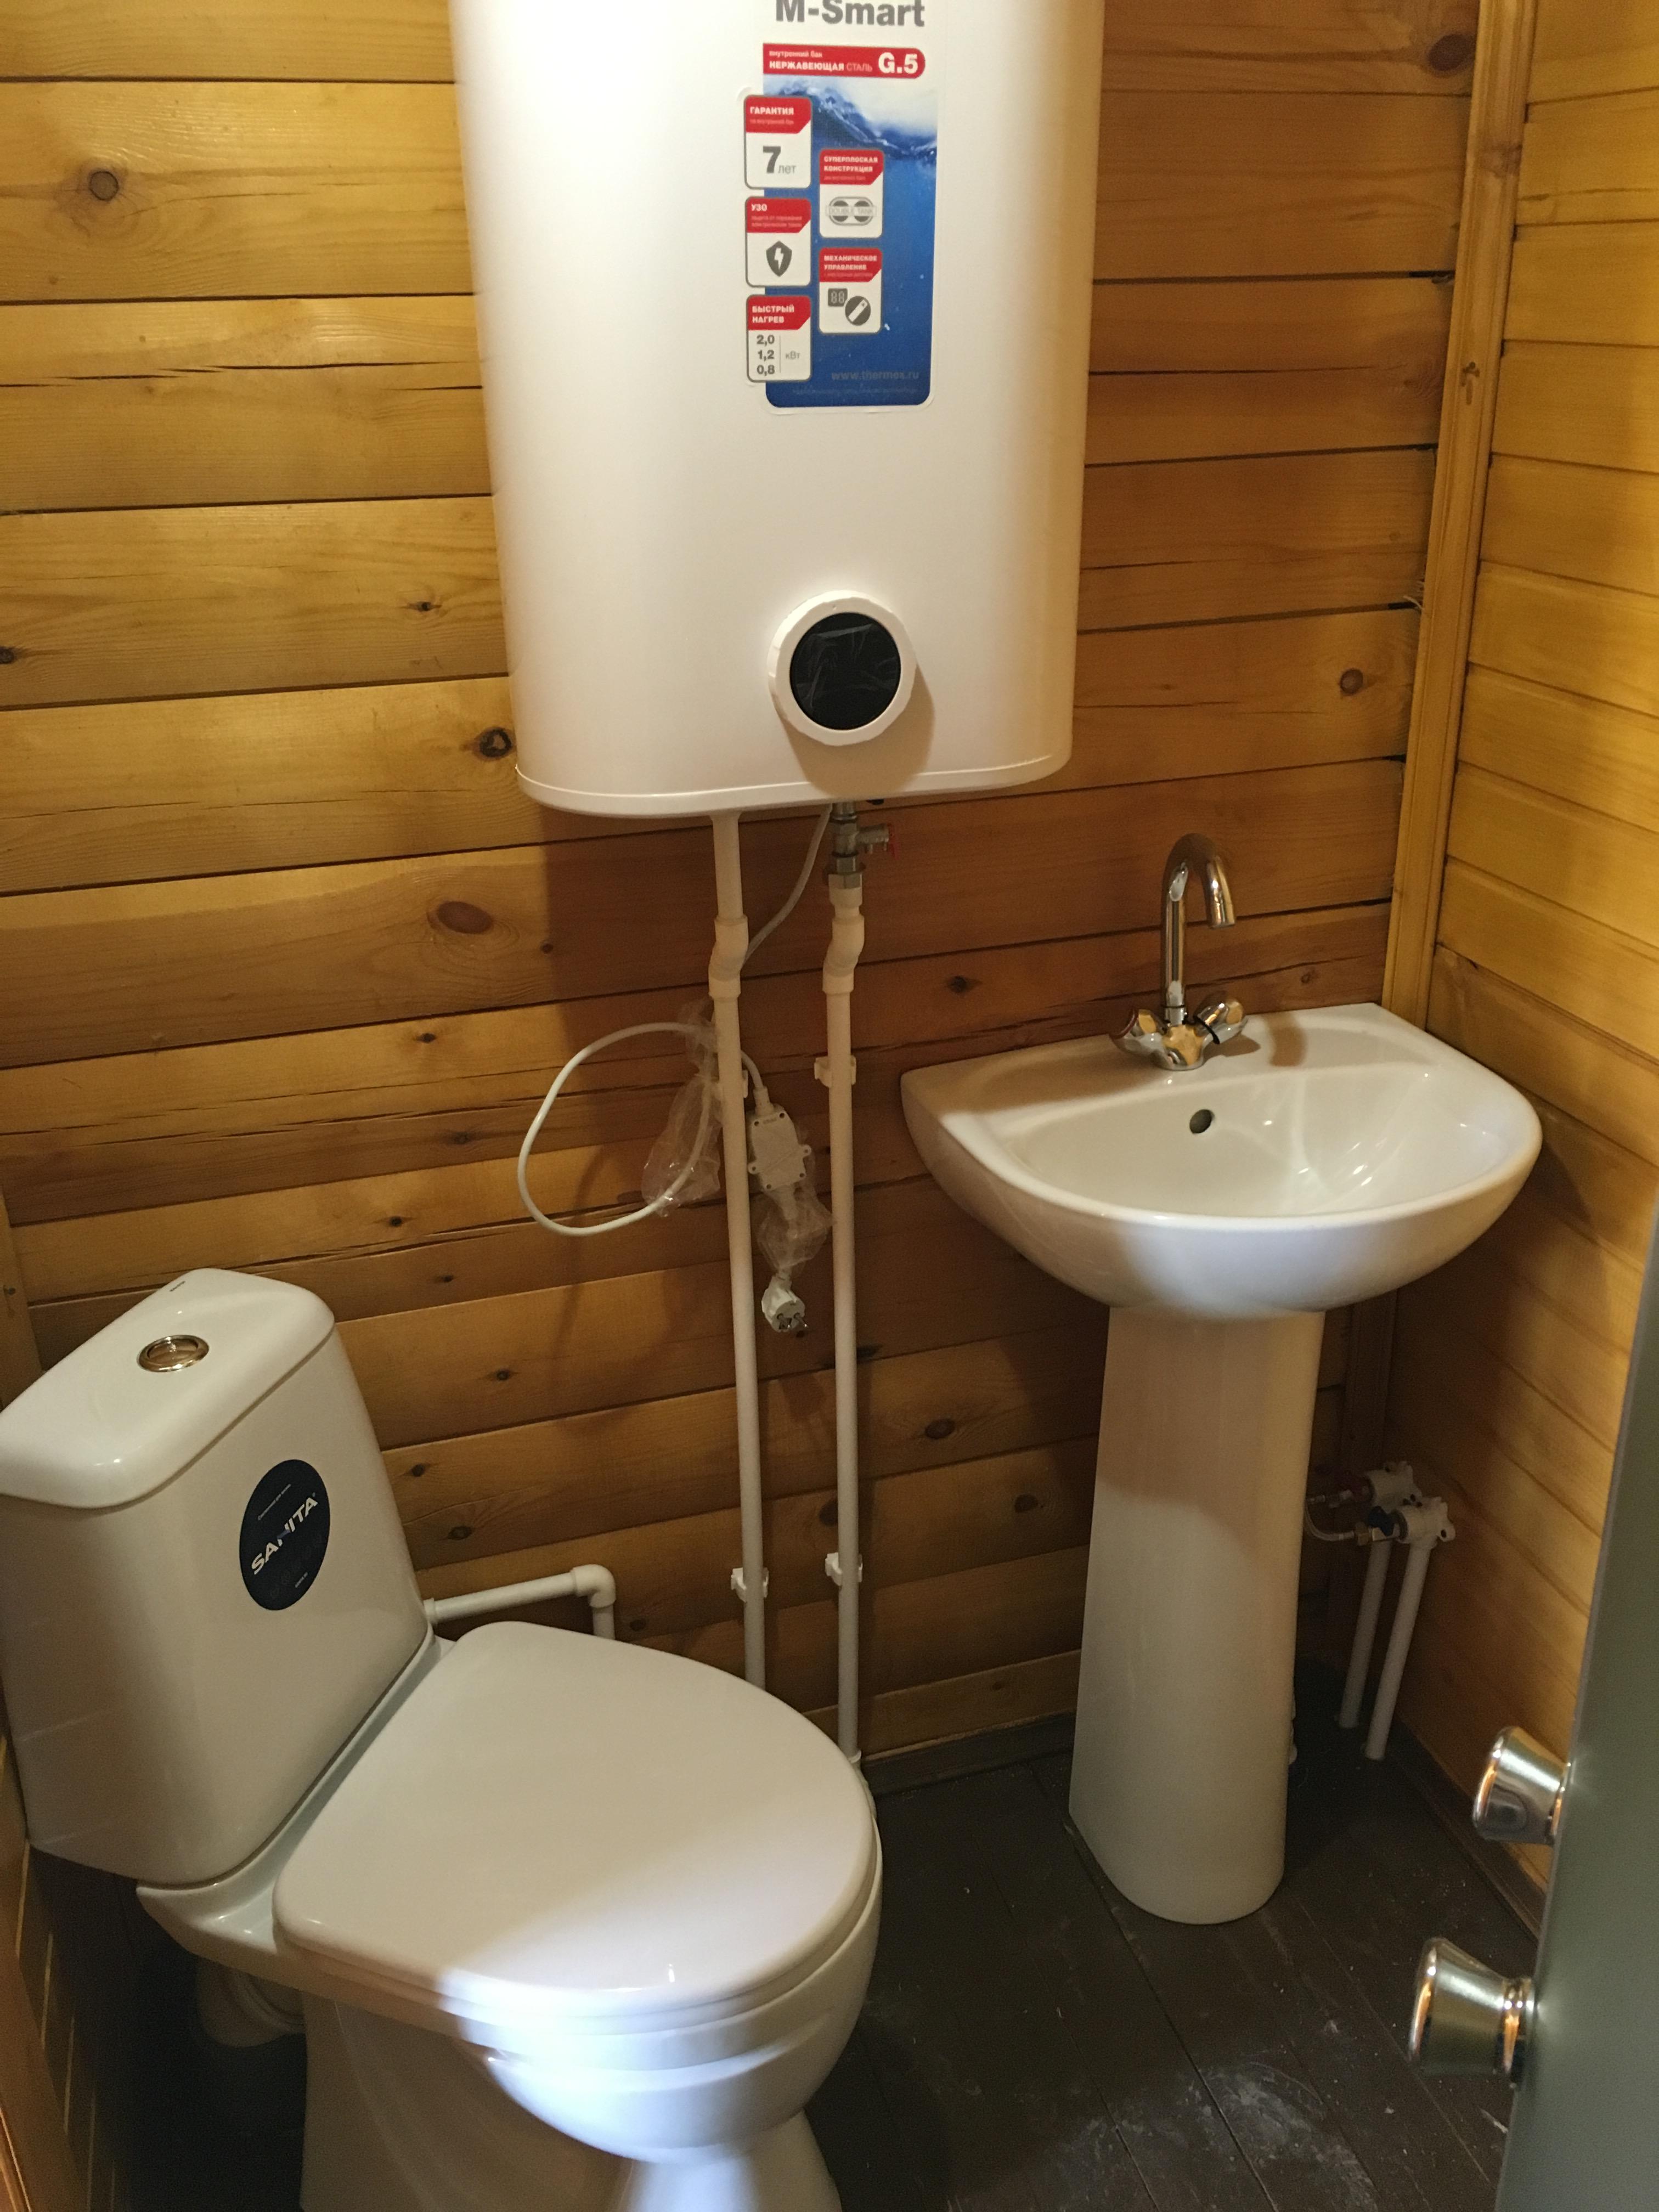 Монтаж водоснабжения и сантехники